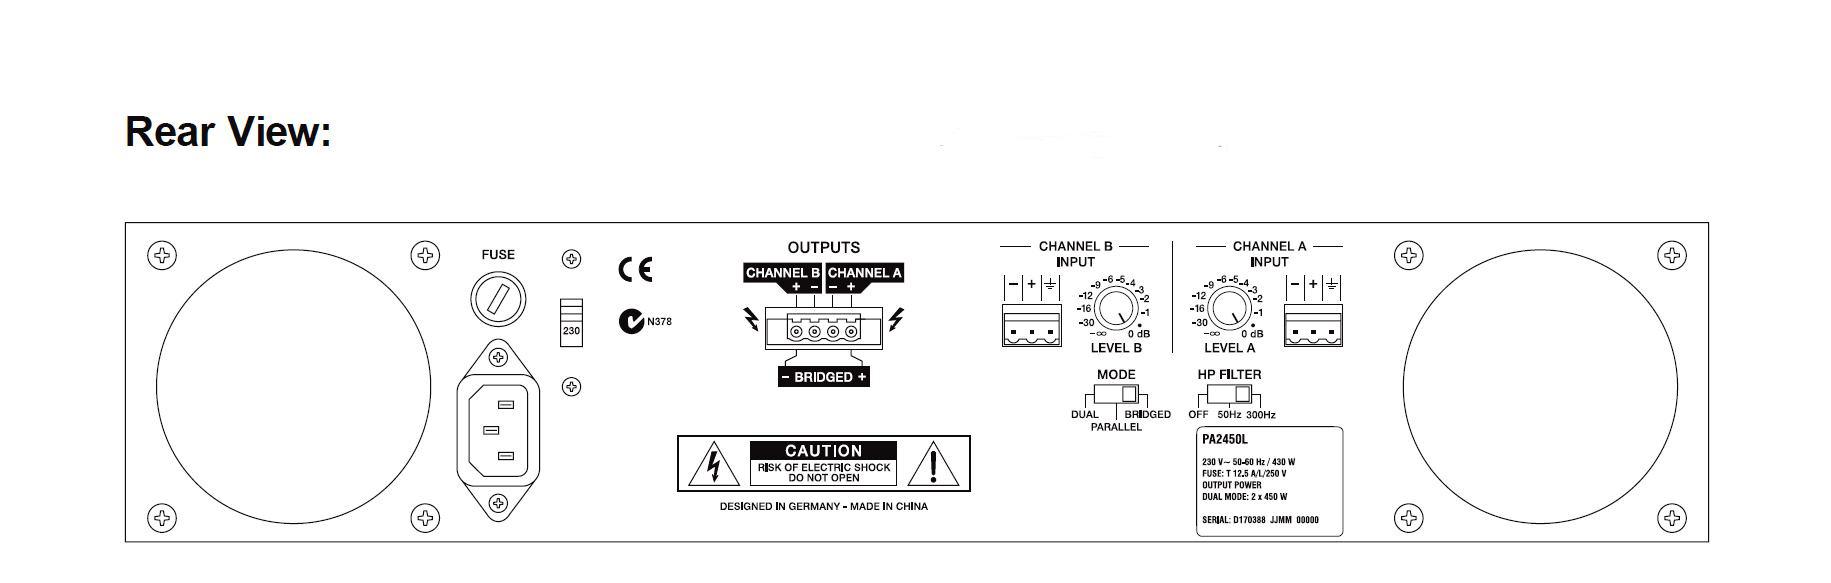 Electro Voice Pa 2450l 2 X 450 Watt Dual Channel Power Amplifier Bridging Adapter For Amplifiers